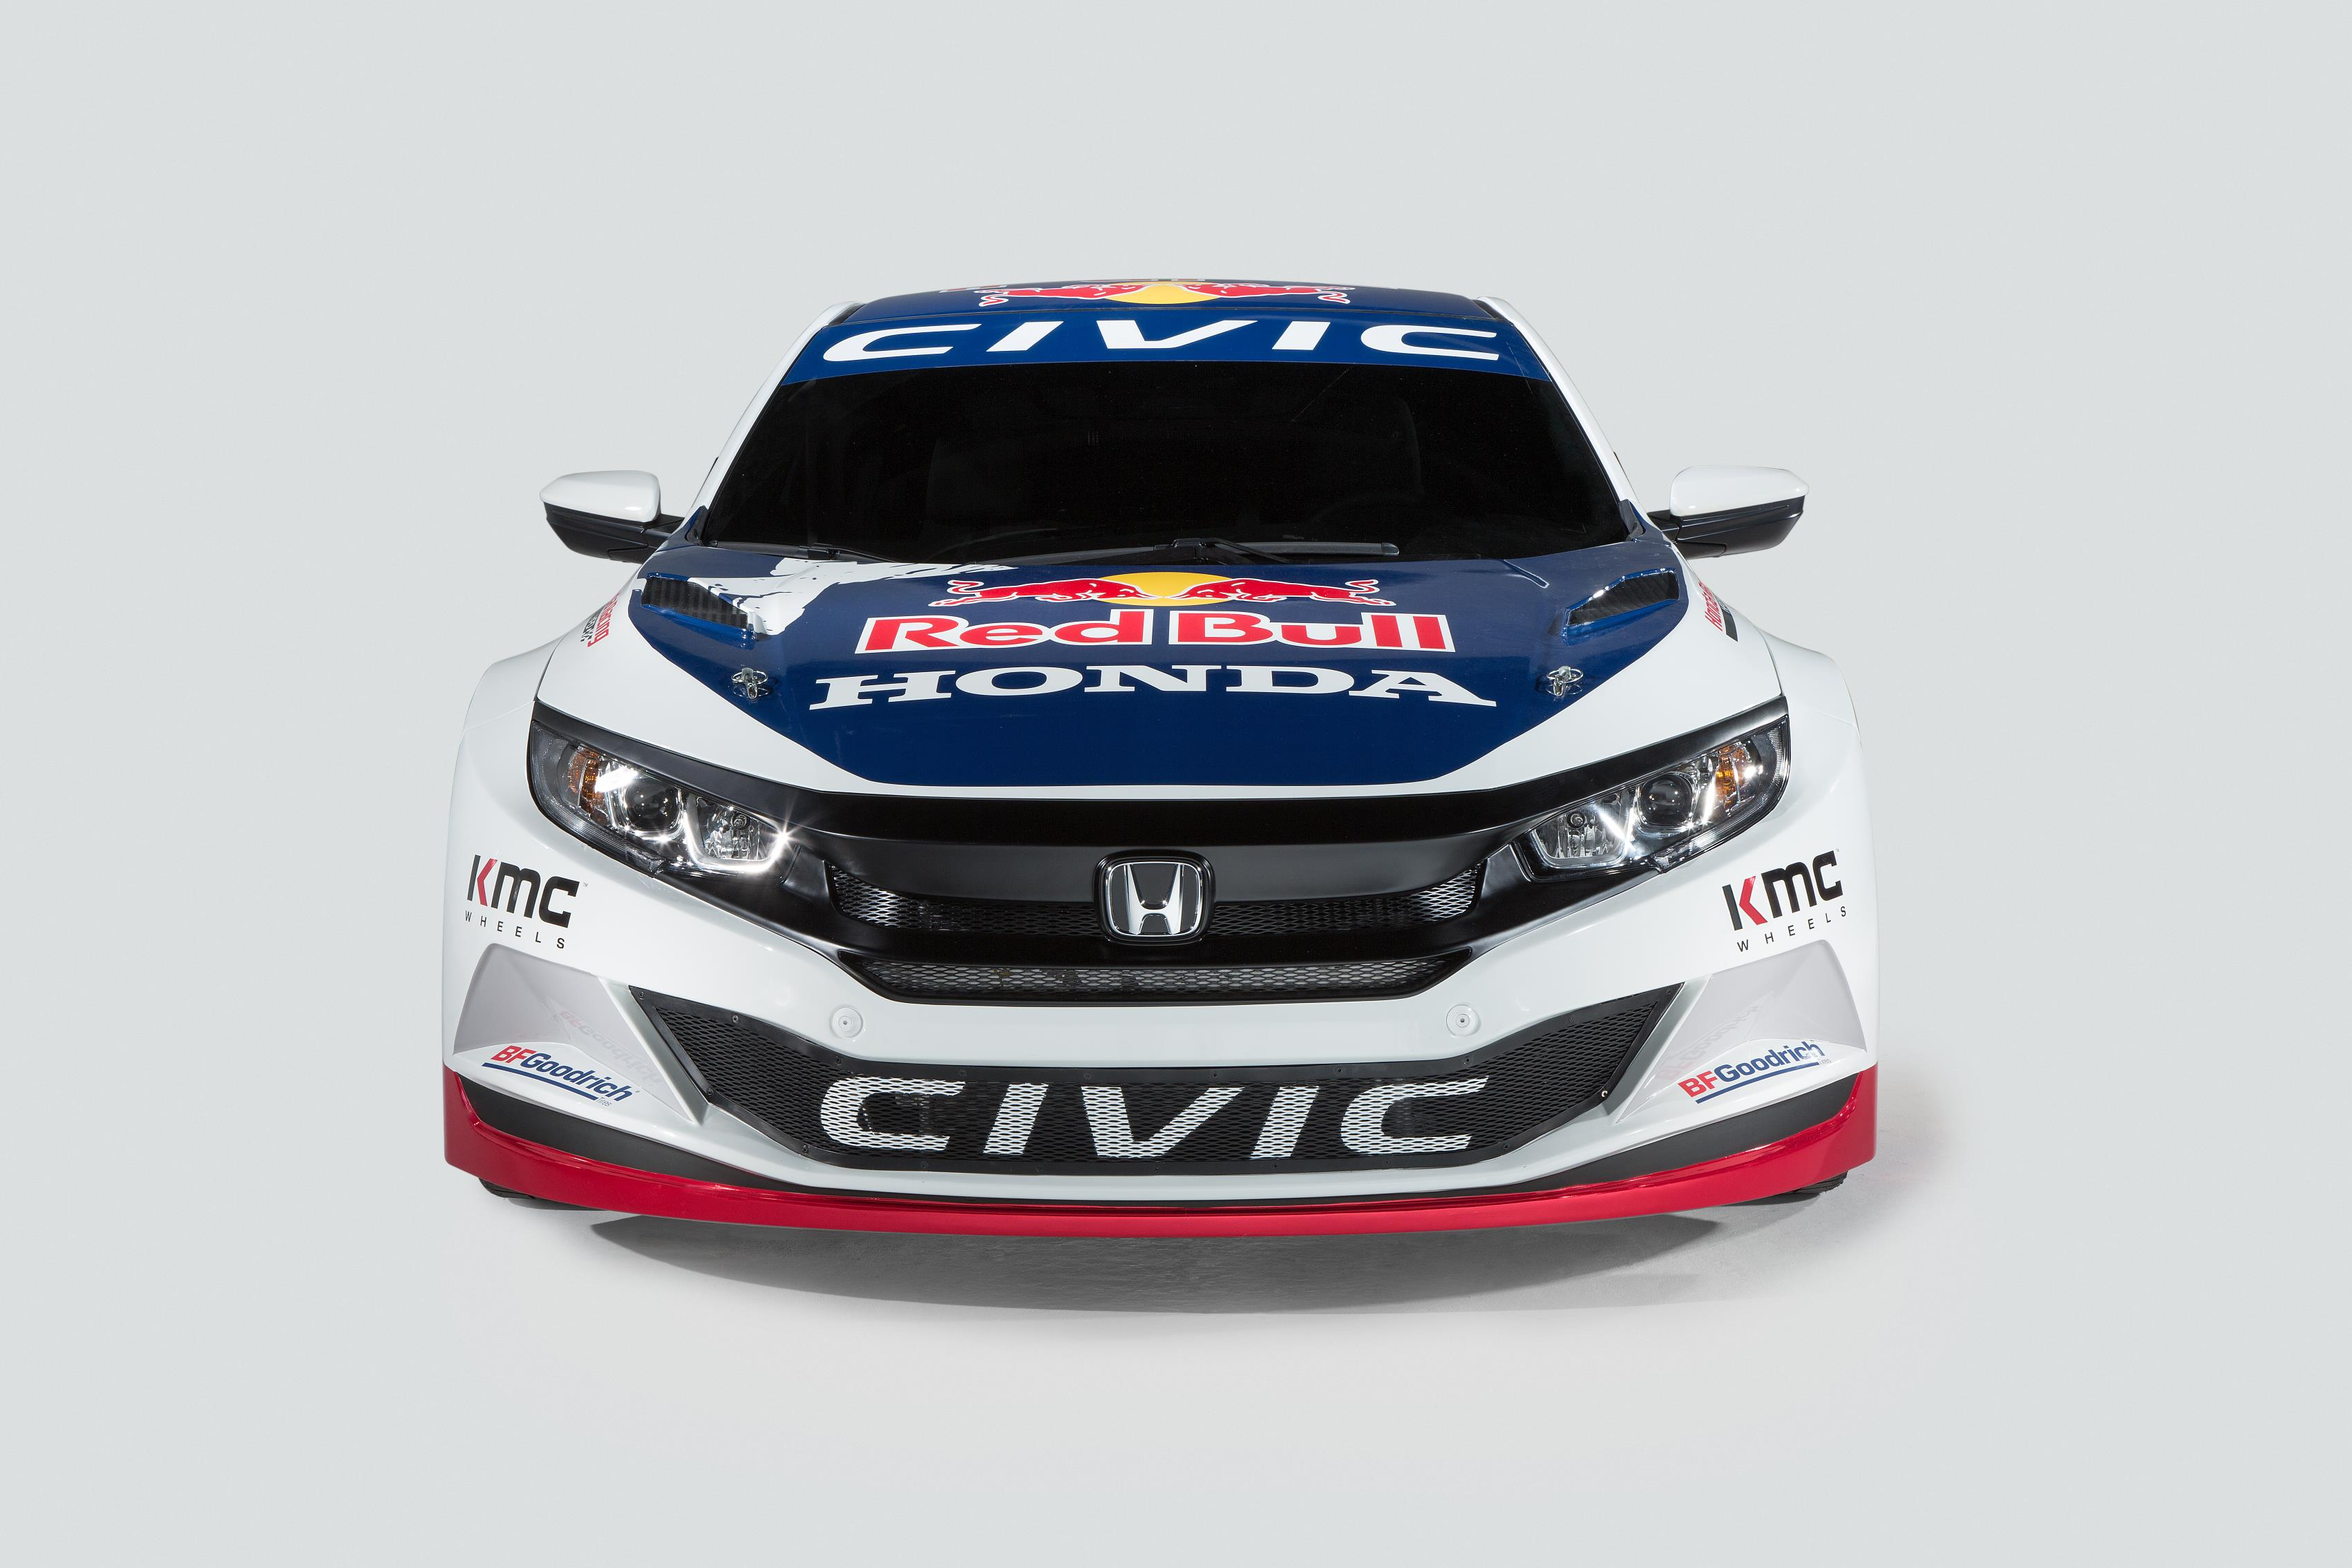 Honda Civic Coupe Red Bull Global Rallycross Race Car Debuts